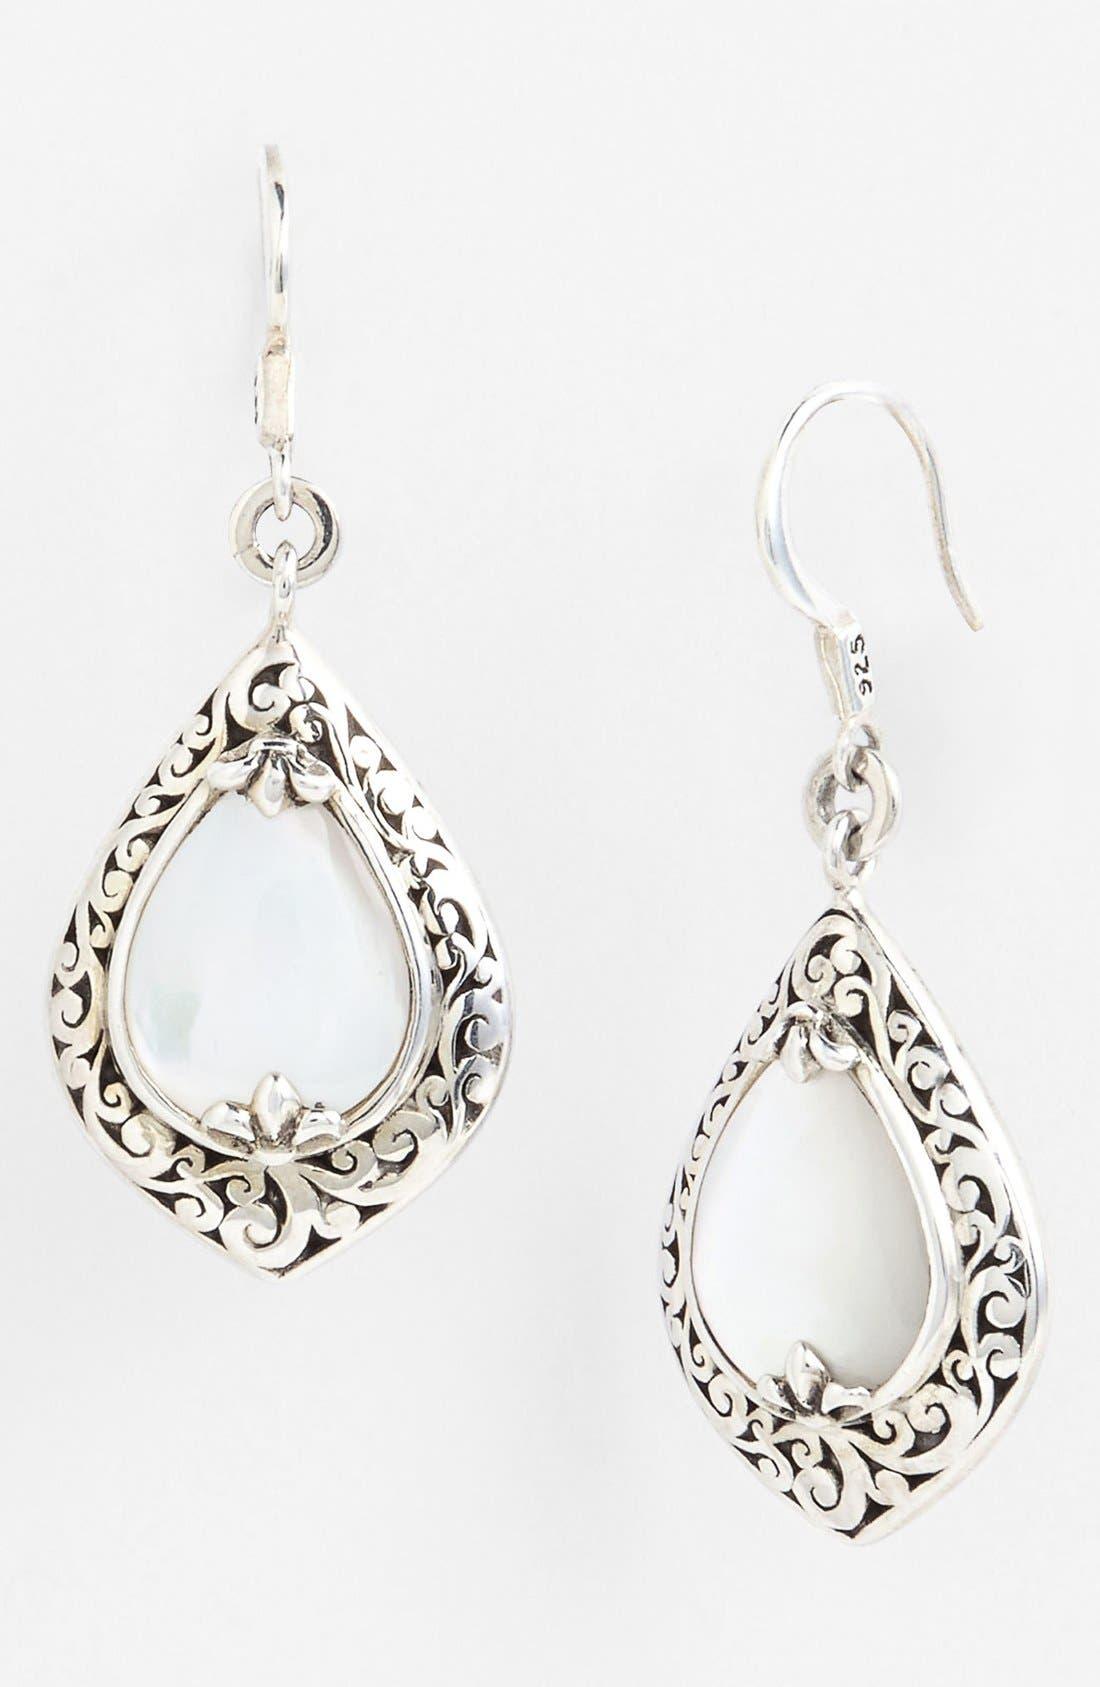 Main Image - Lois Hill Medium Mother-of-Pearl Teardrop Earrings